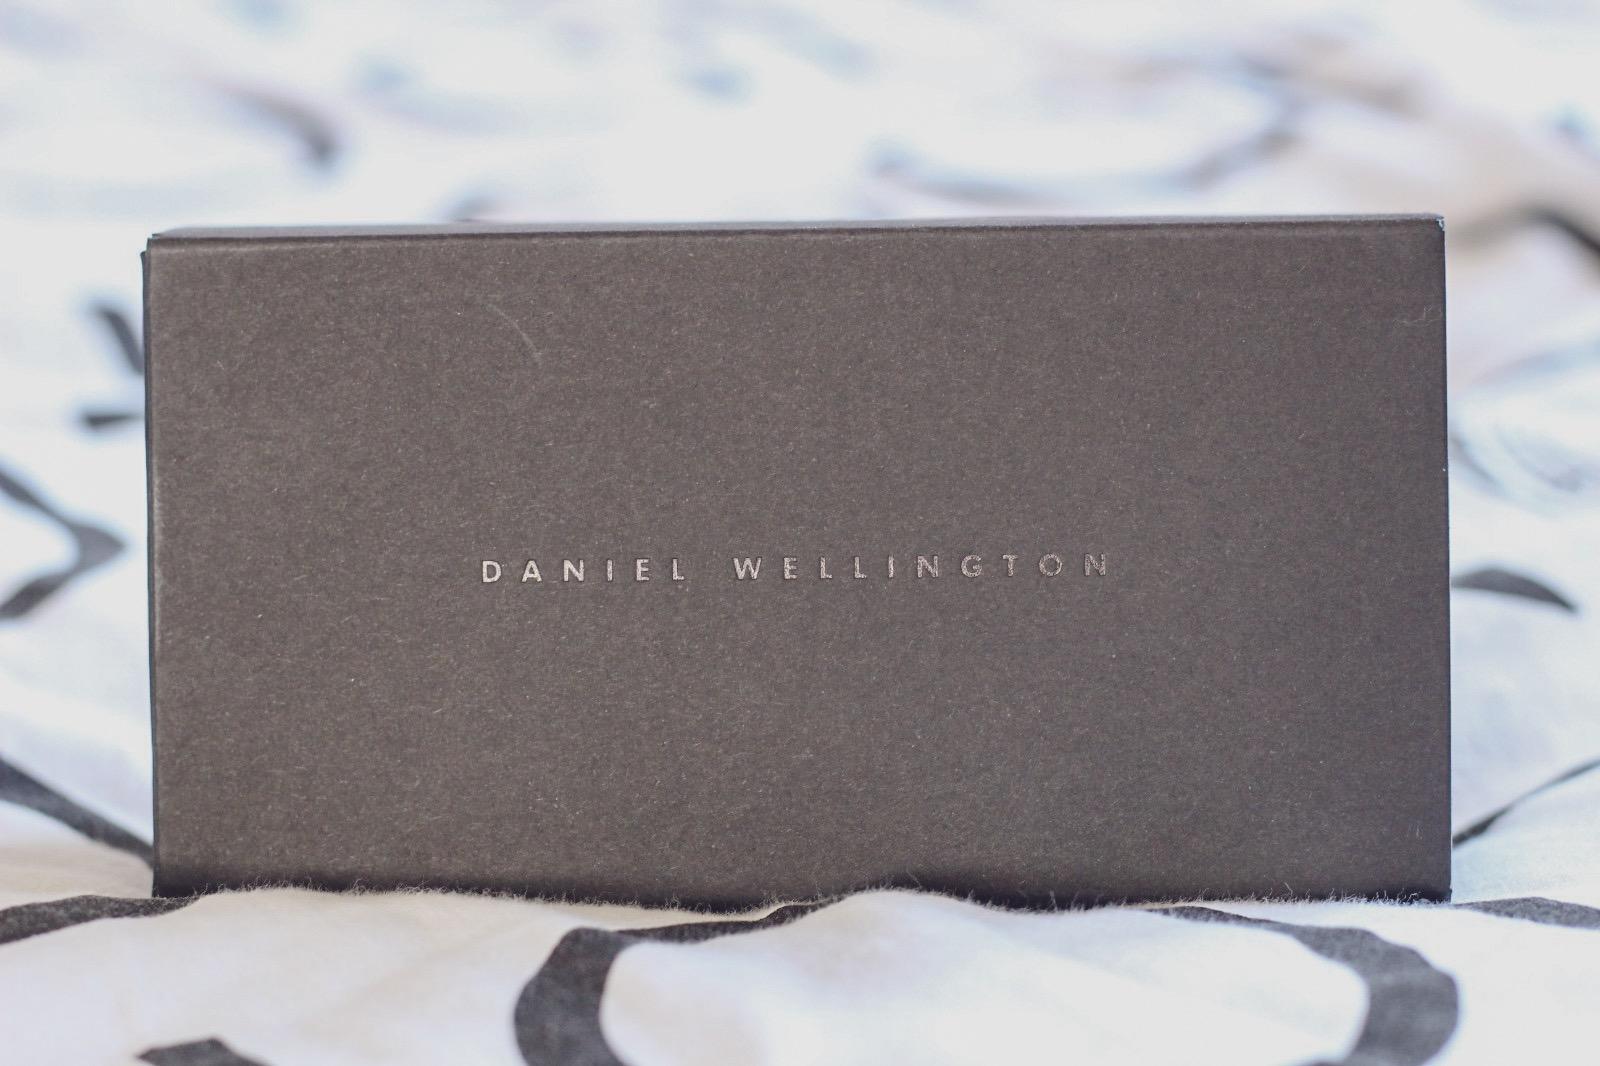 MY DANIEL W.